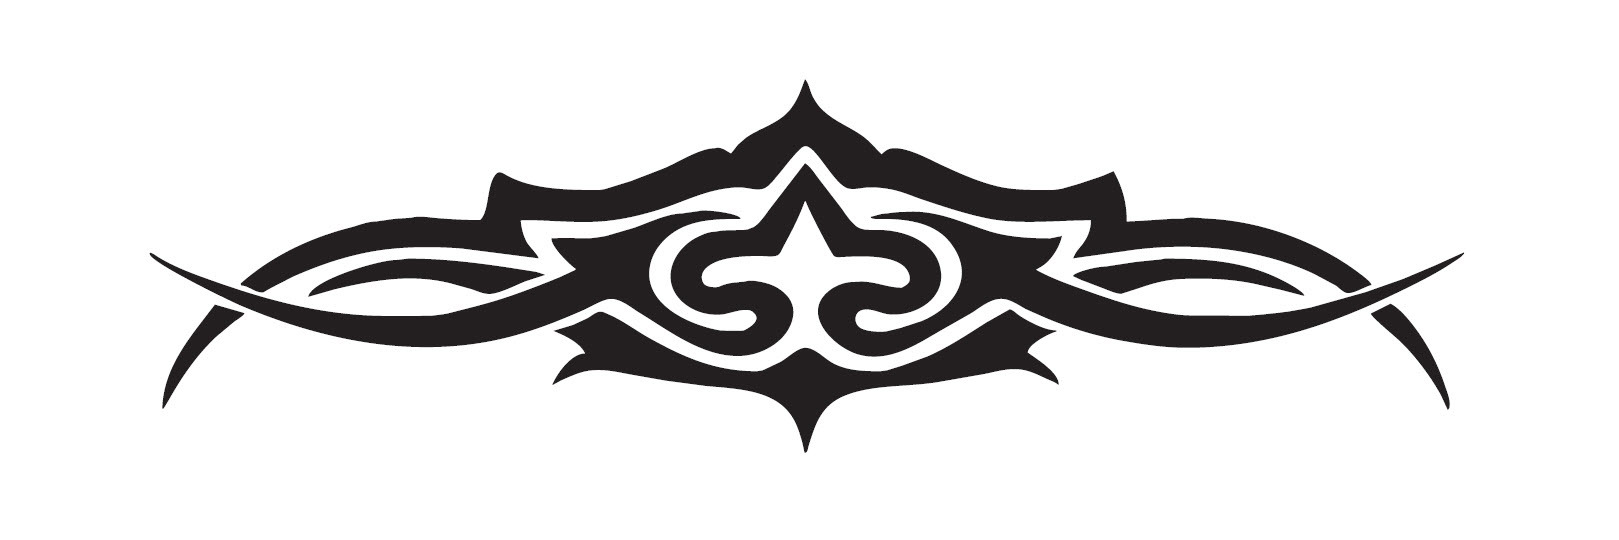 100mm Hi Gloss Black Sticker. Classic Tattoo Design. Suitable for Bikes, Helmets etc. 2323B